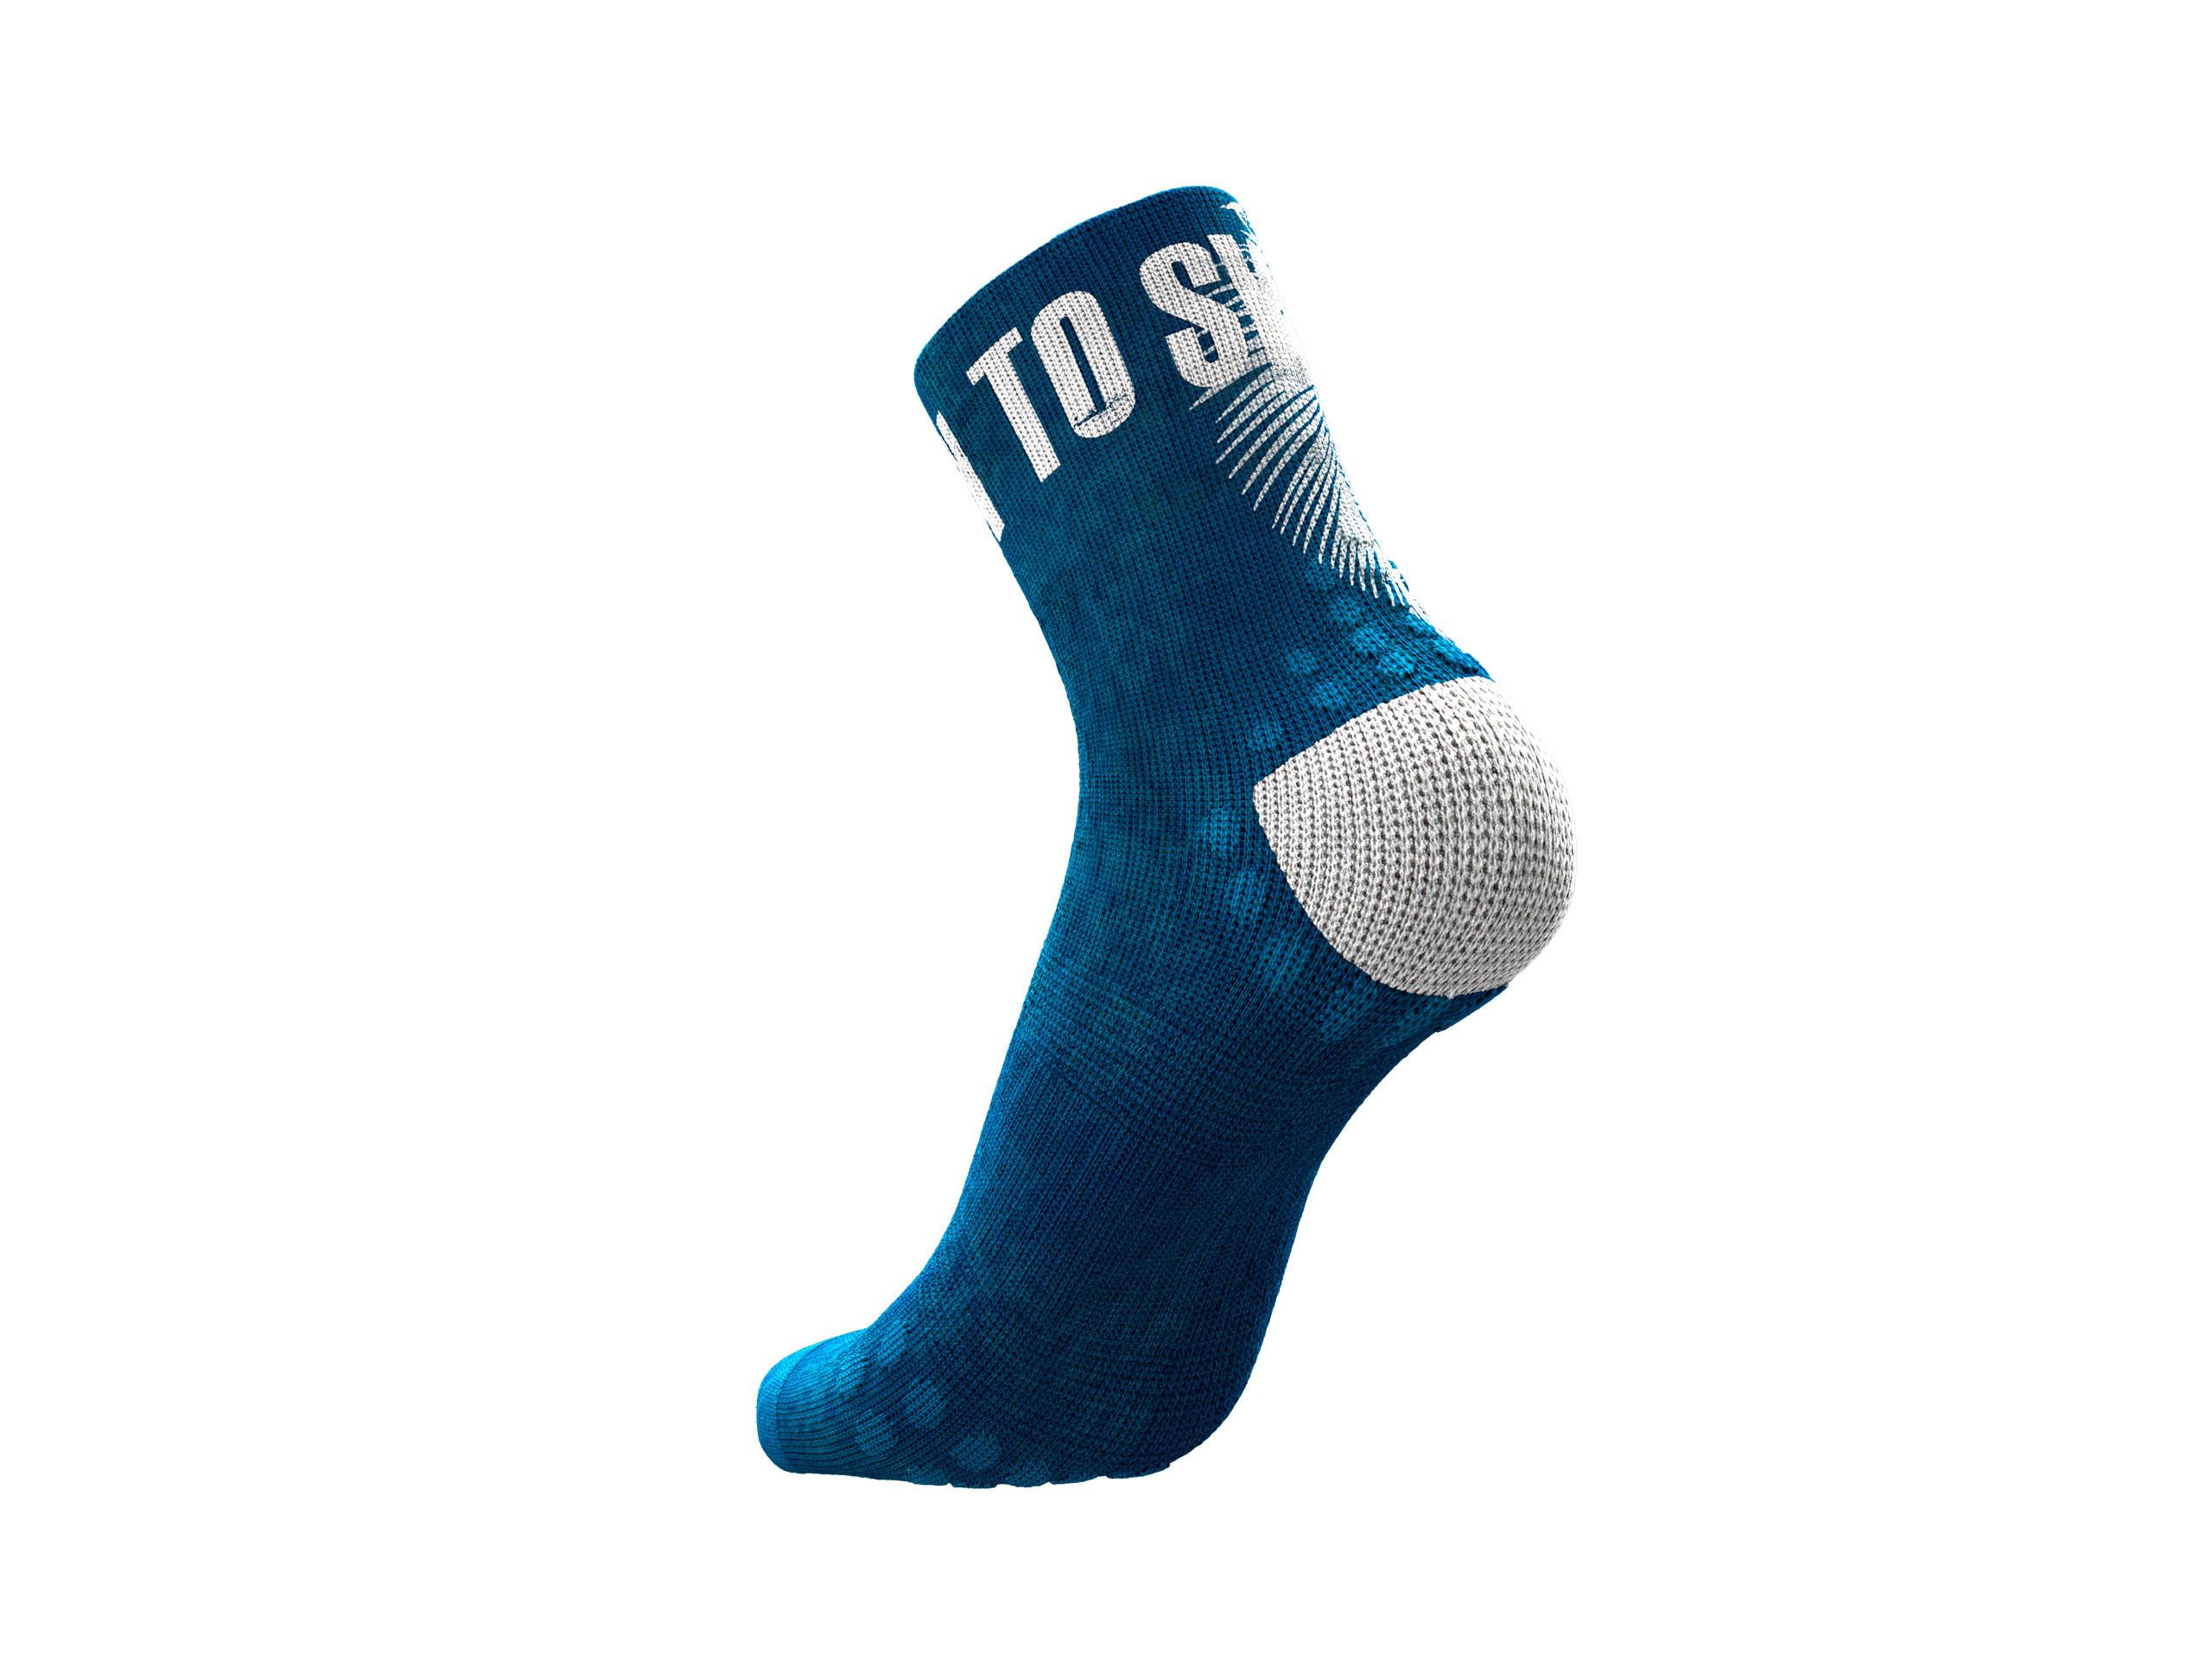 Pro Racing Socks v3.0 Ultralight Run High - Kona 2019